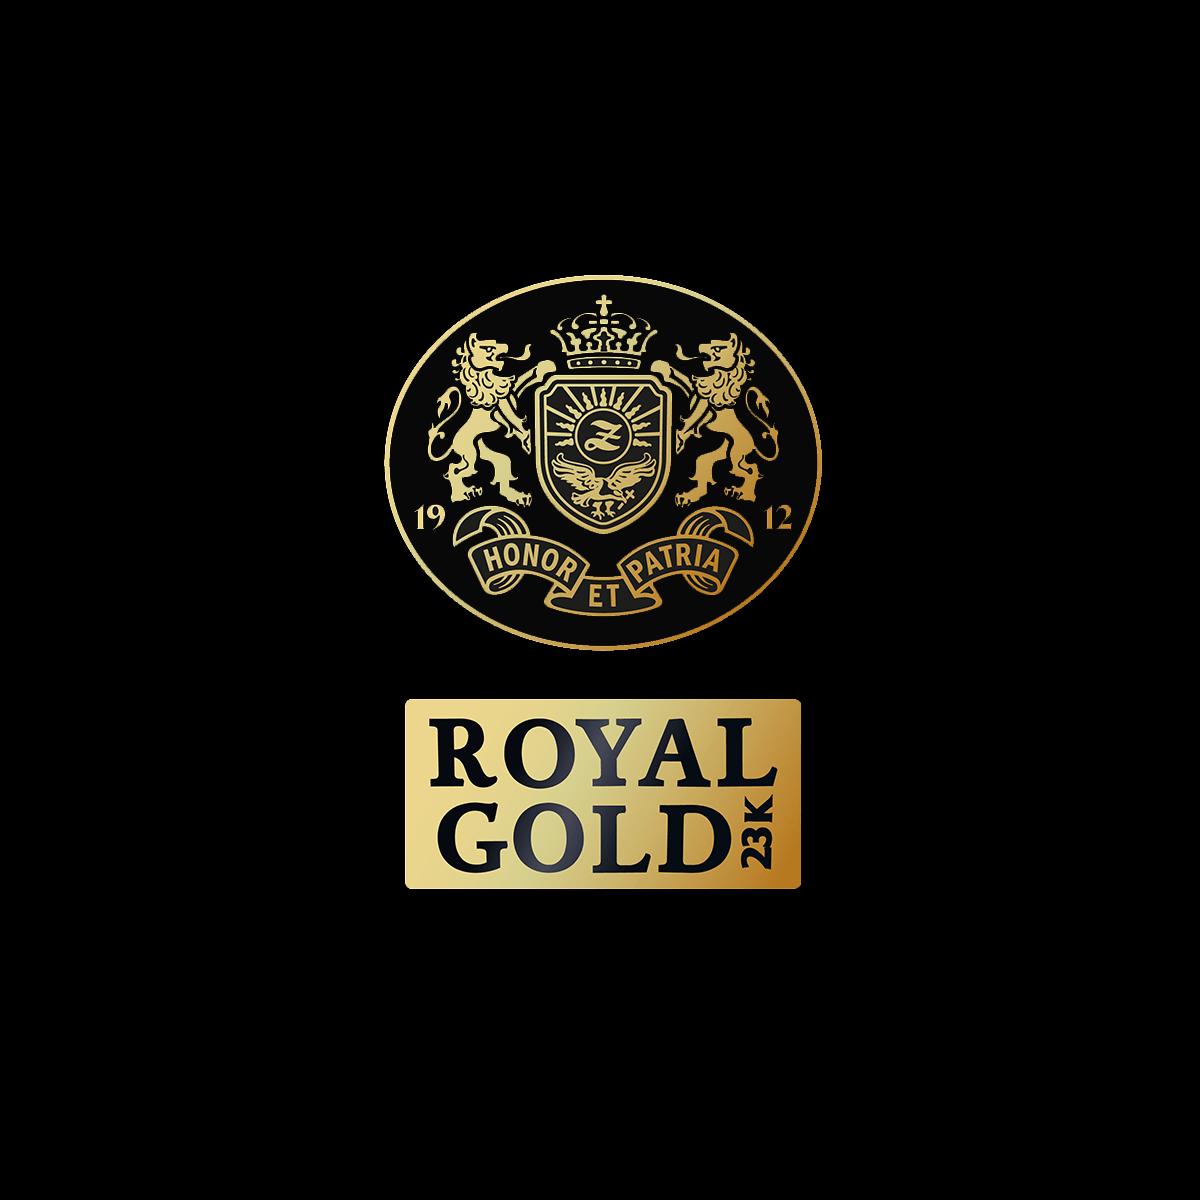 zarea-royal-gold-logo-negru-4